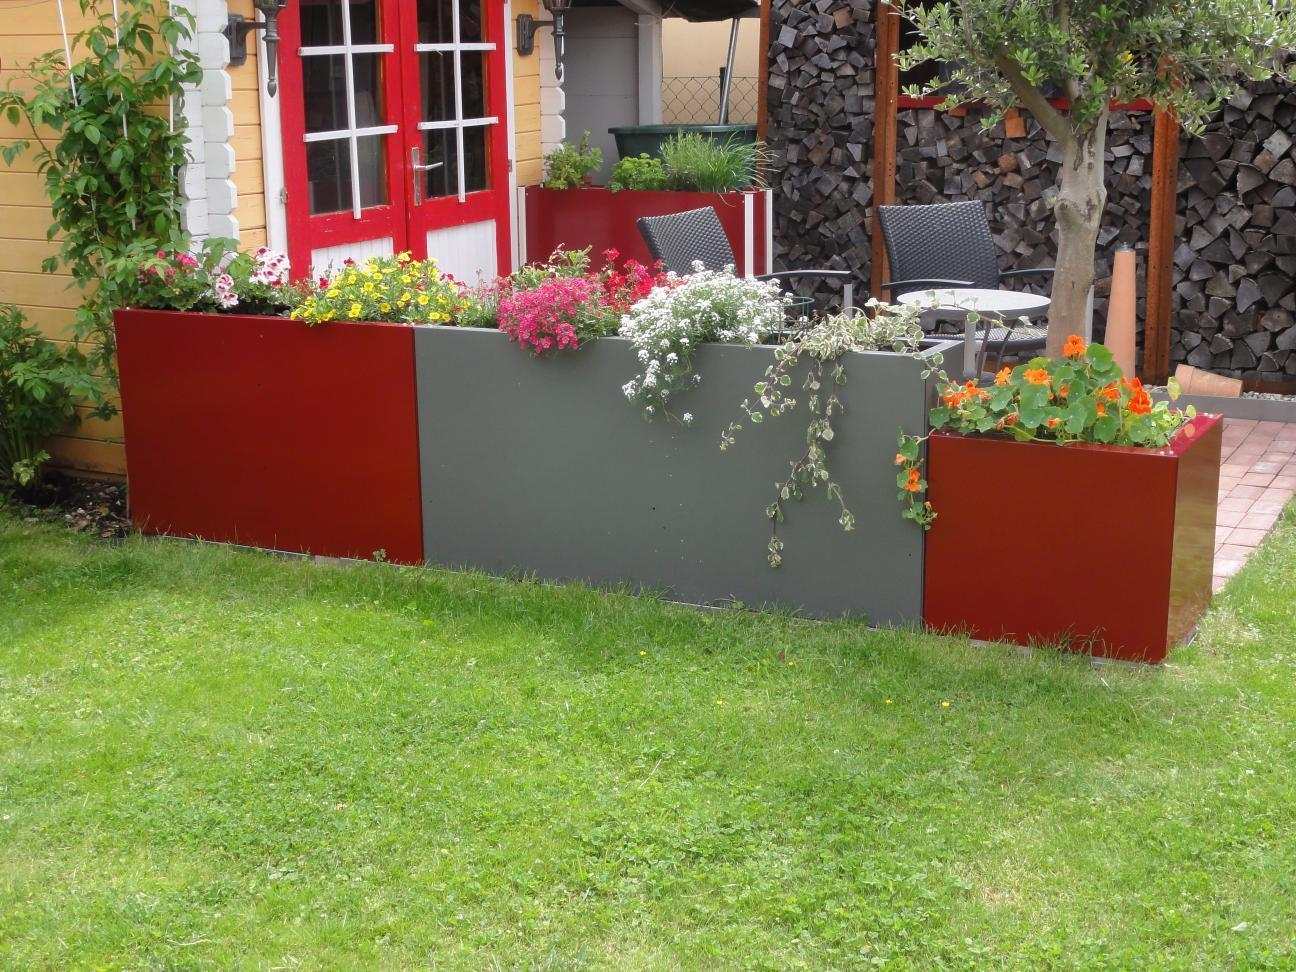 hochbeet urban aus metall 1 1m x 0 3 m x 0 9 m beschichtet. Black Bedroom Furniture Sets. Home Design Ideas